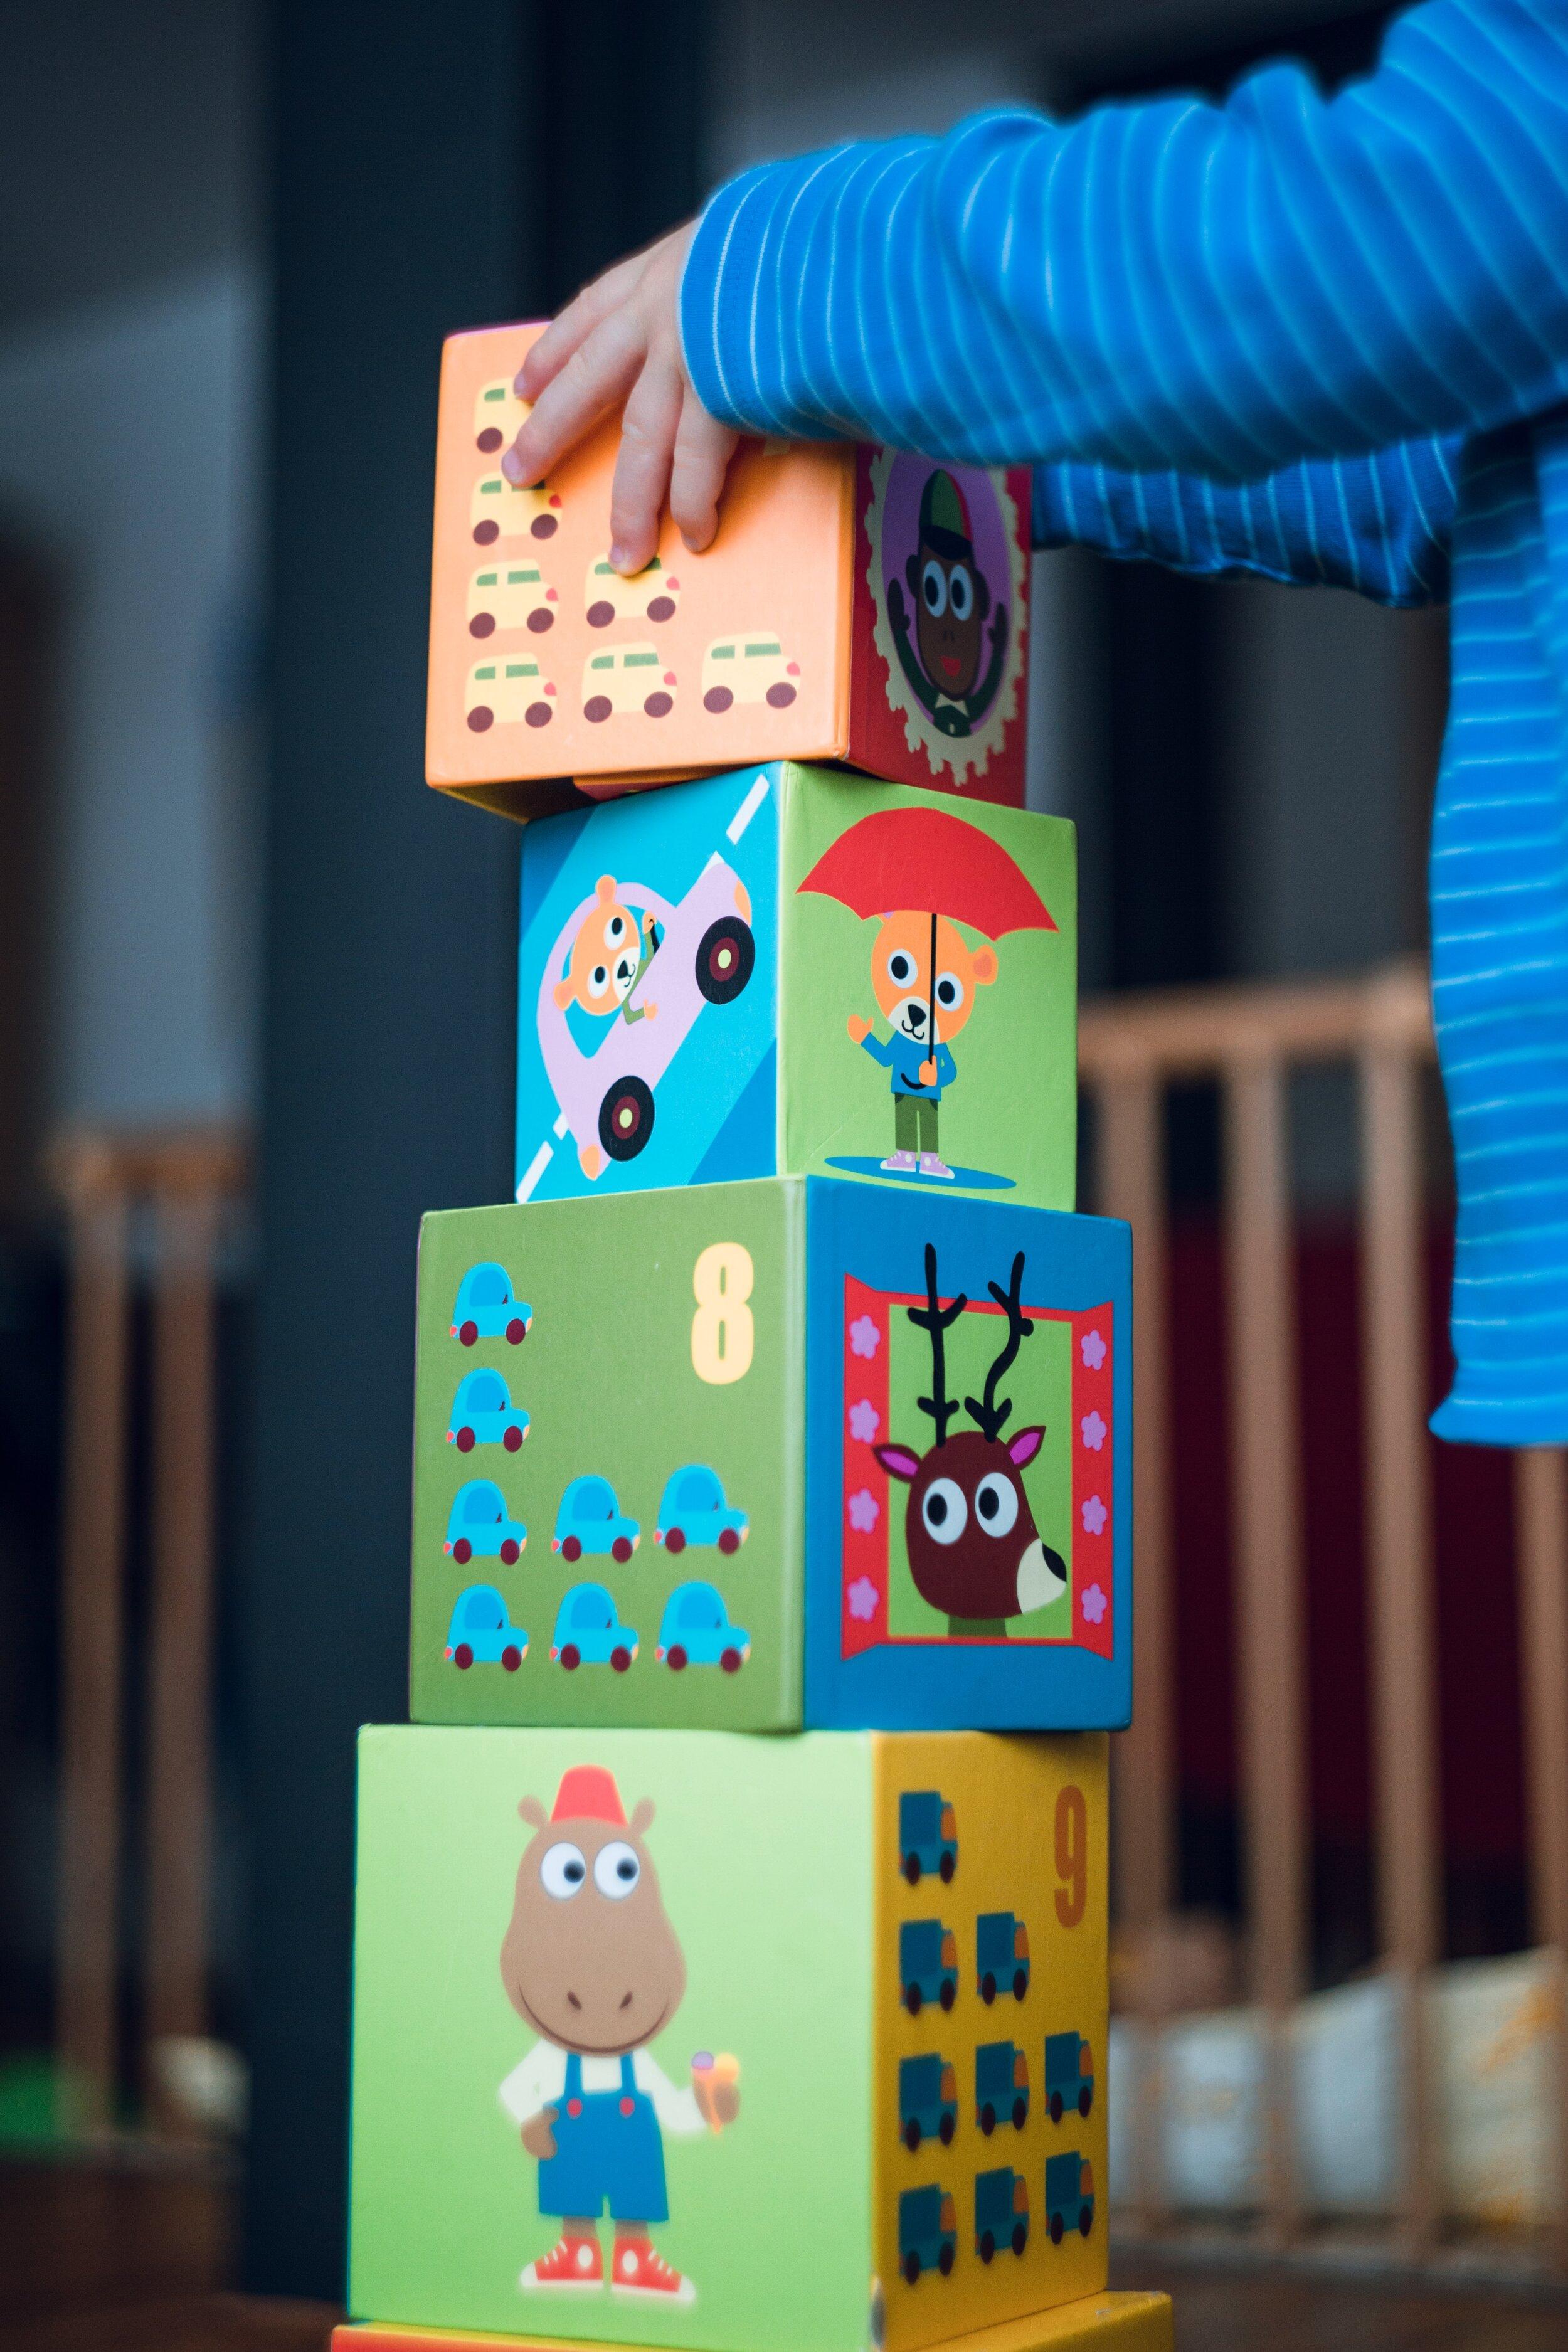 Child_stacks_blocks.jpg